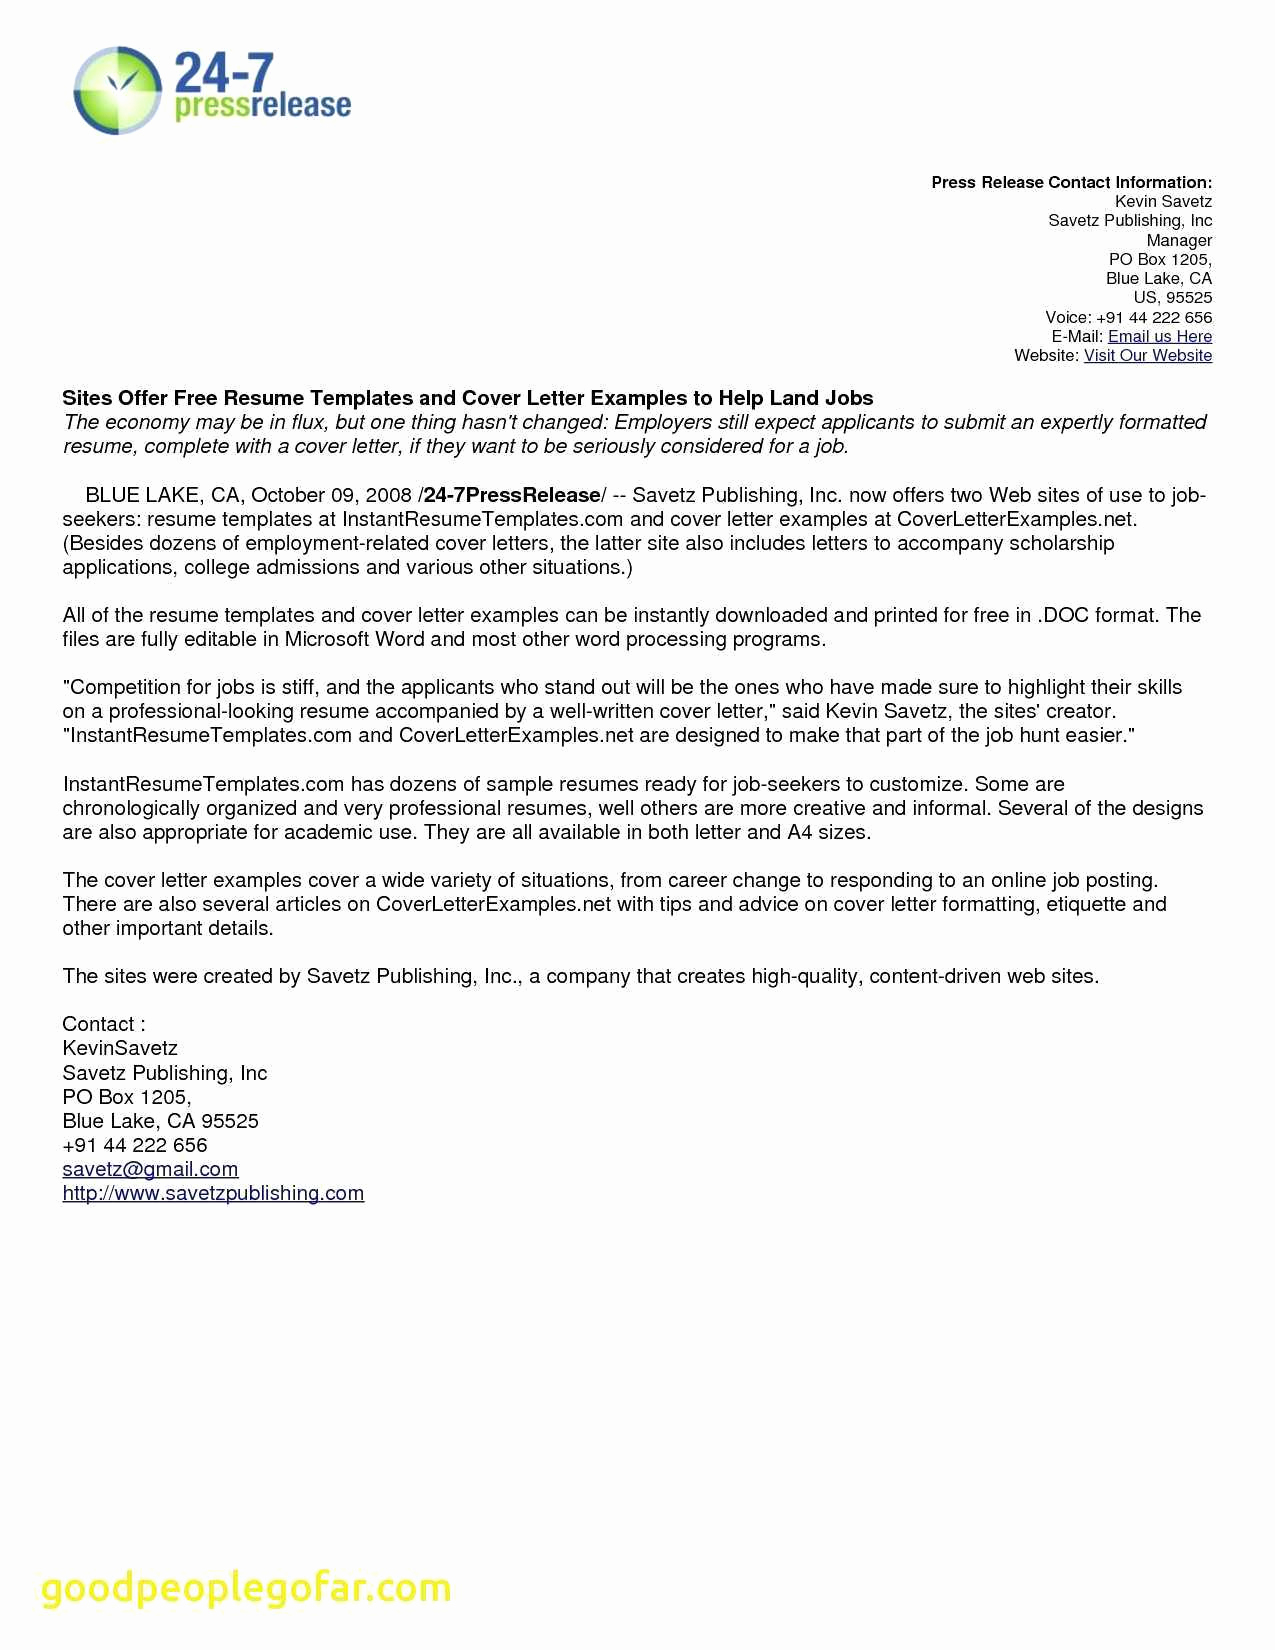 Employment Offer Letter Template California - Fer Letter Template